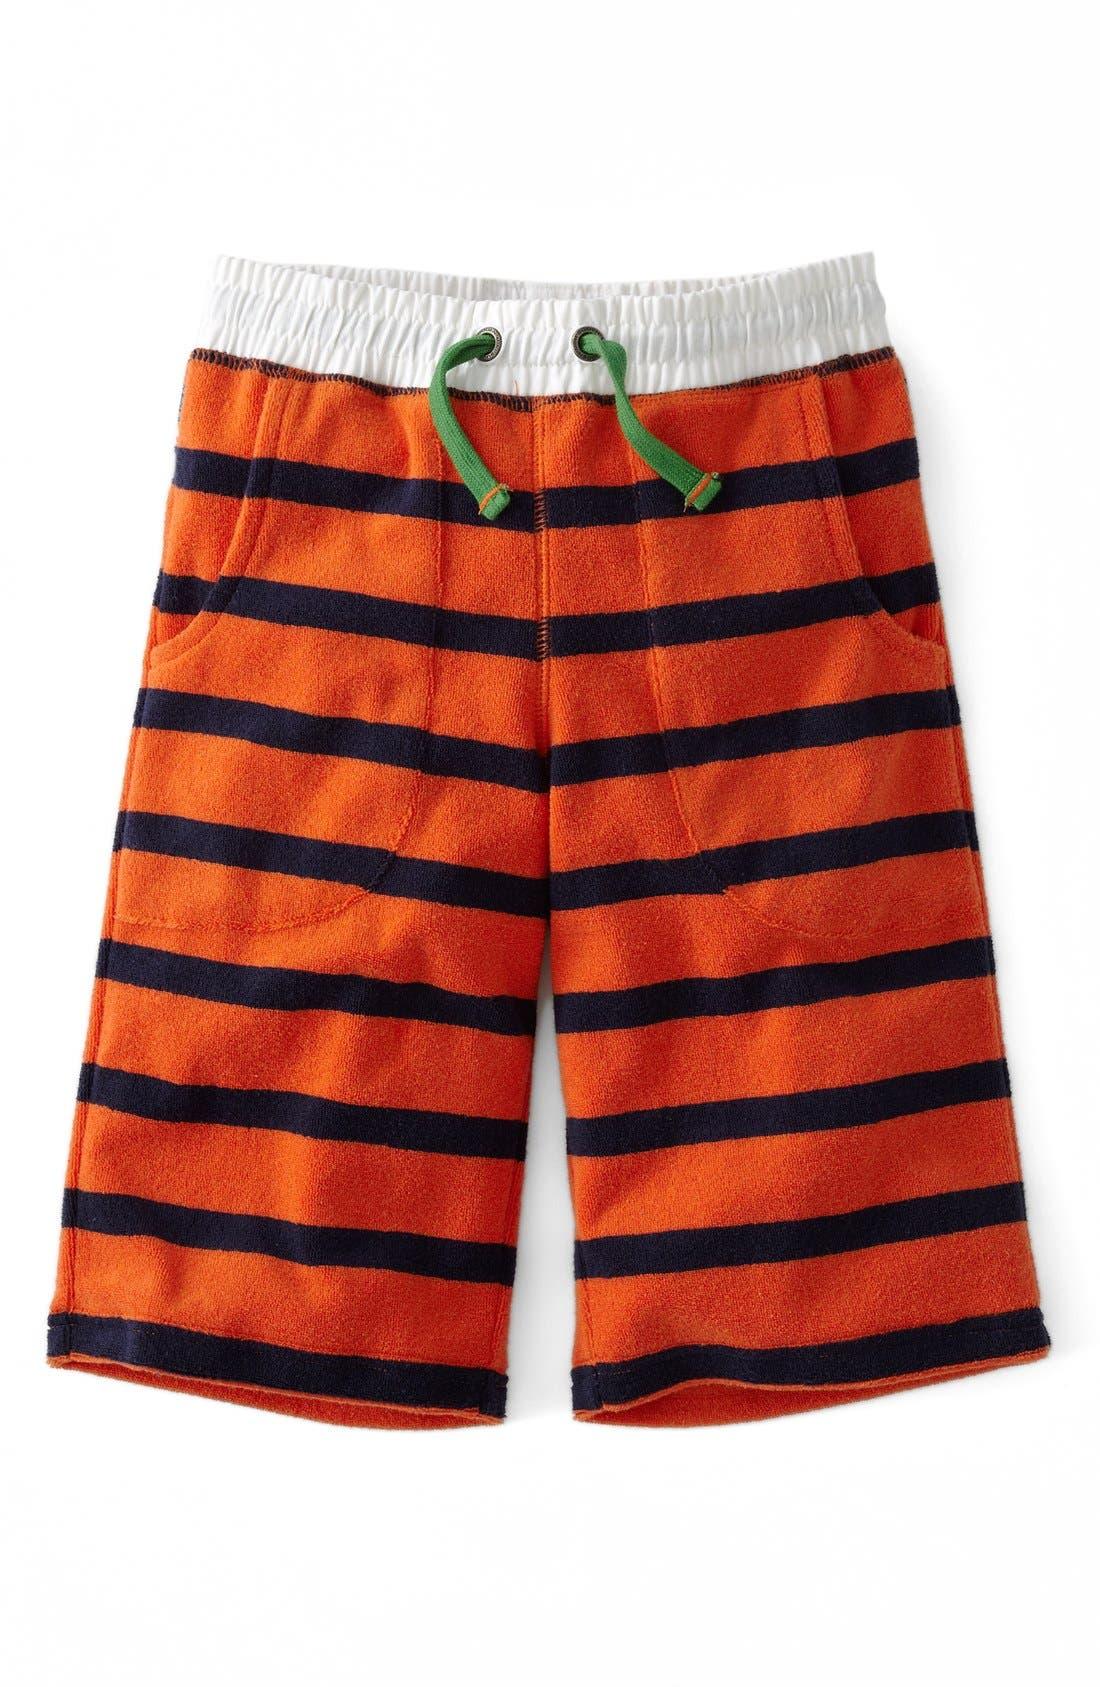 Main Image - Mini Boden Towelling Shorts (Toddler Boys, Little Boys & Big Boys)